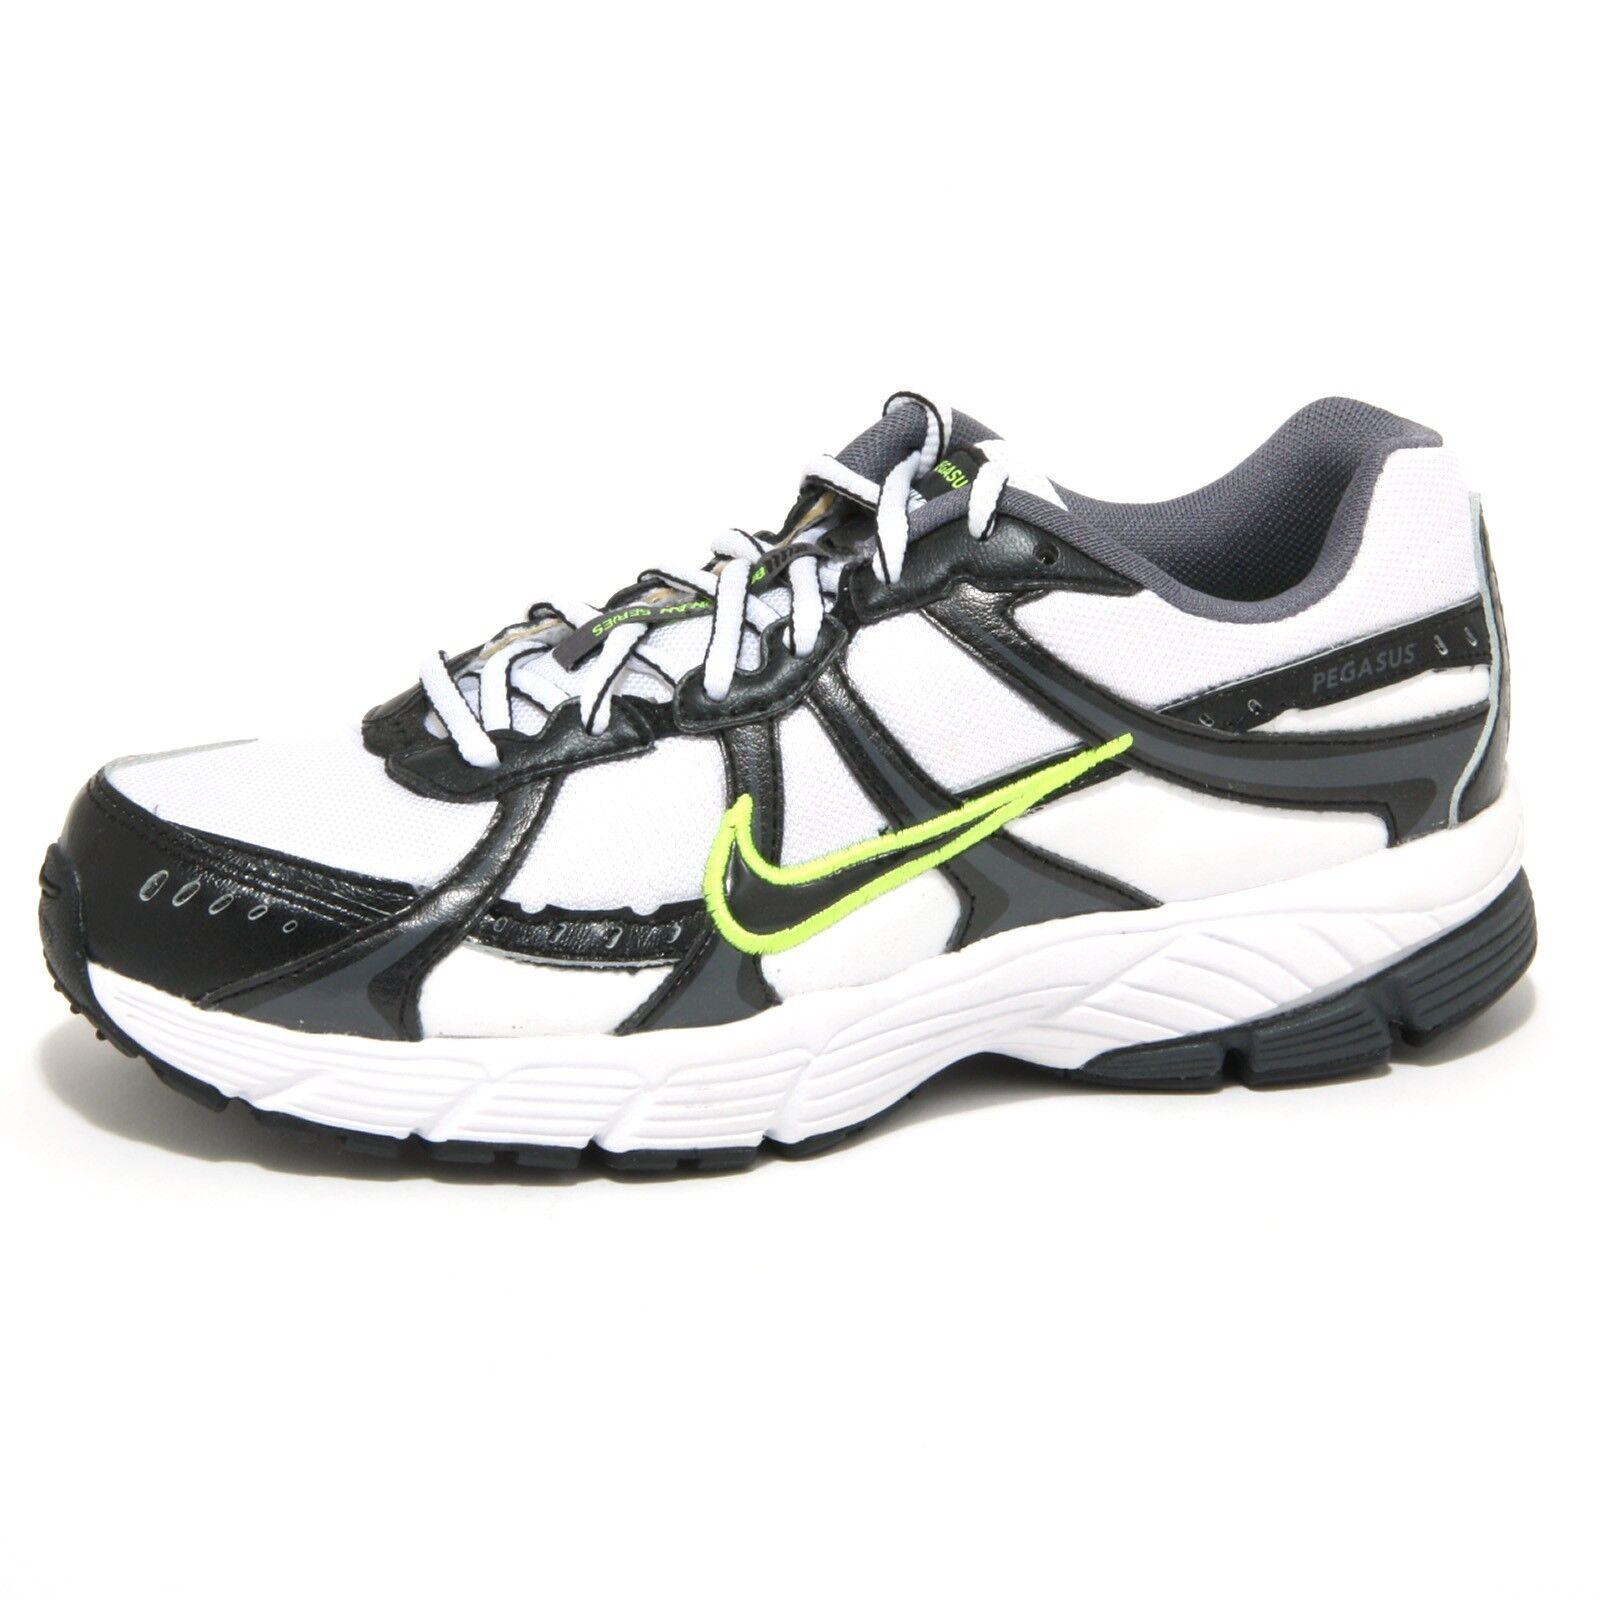 1276O sneaker NIKE AIR PEGASUS bianco/nero scarpe donna shoes women